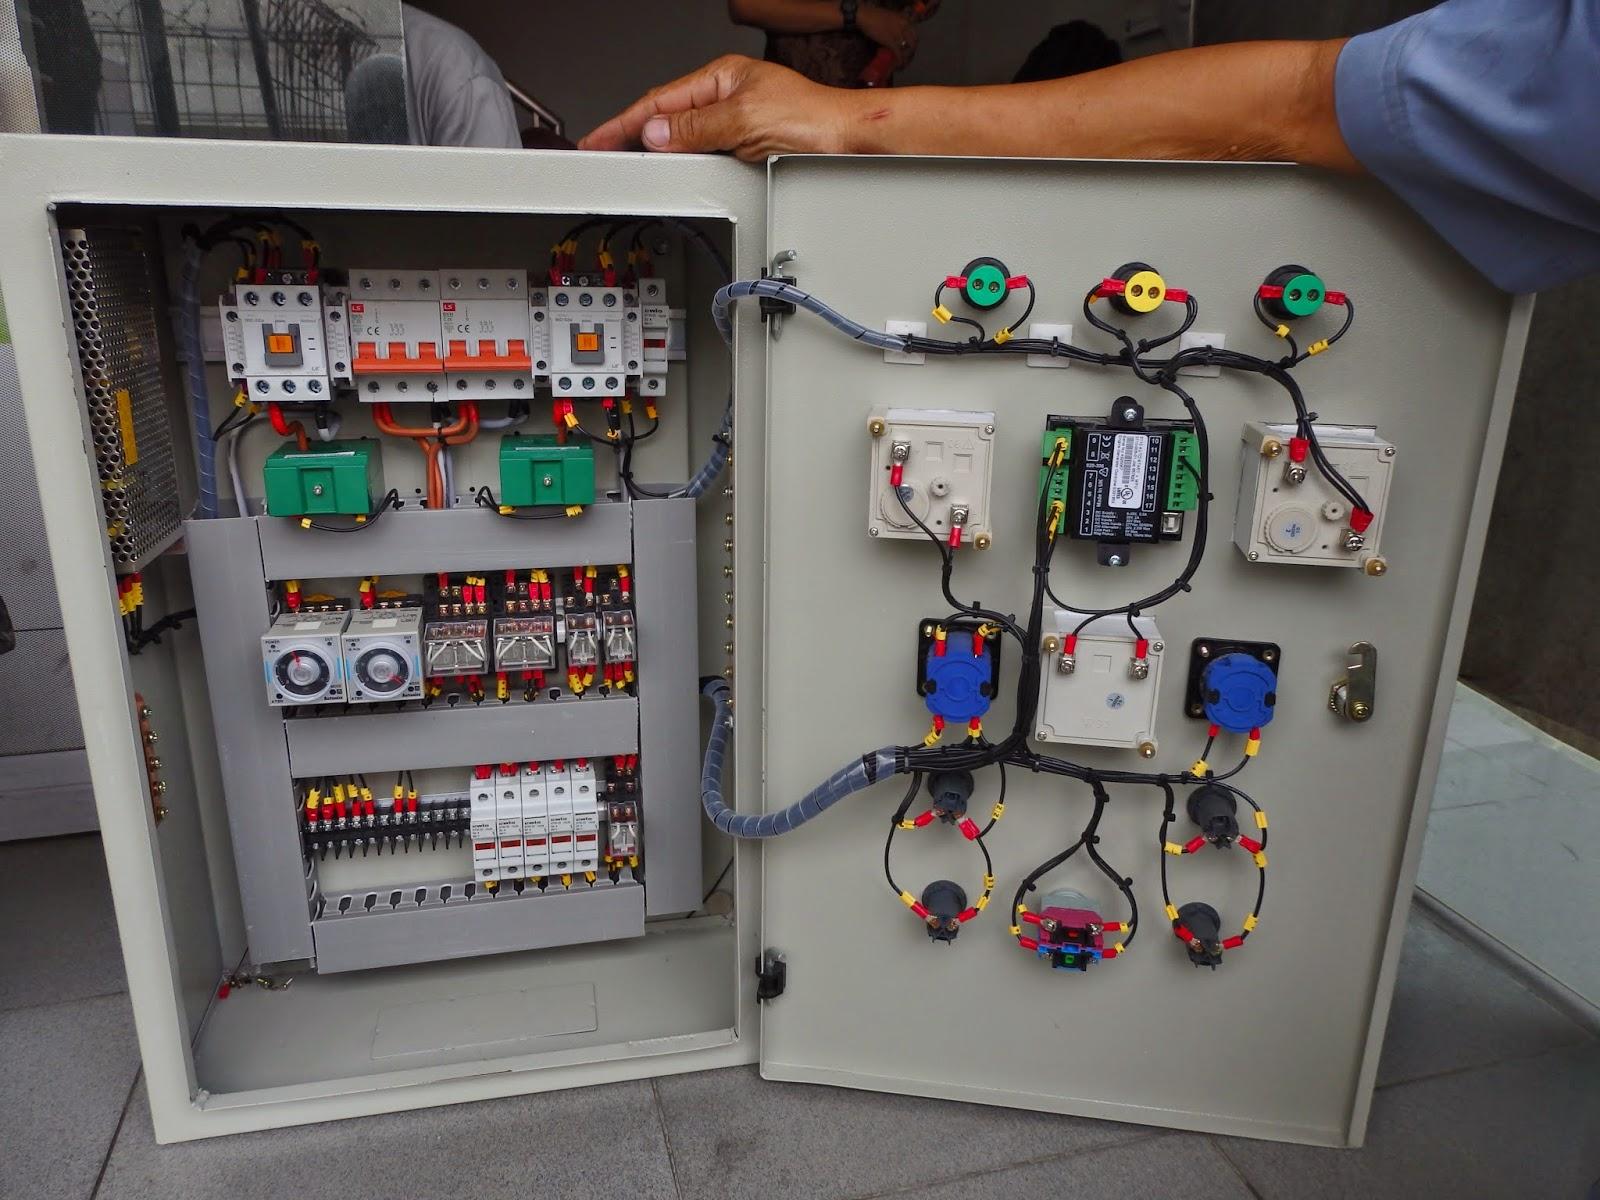 a portable generator to breaker panel wiring diagram for your home generator synchronizing panel wiring diagram maret 2015 jaya electro mandiri panel